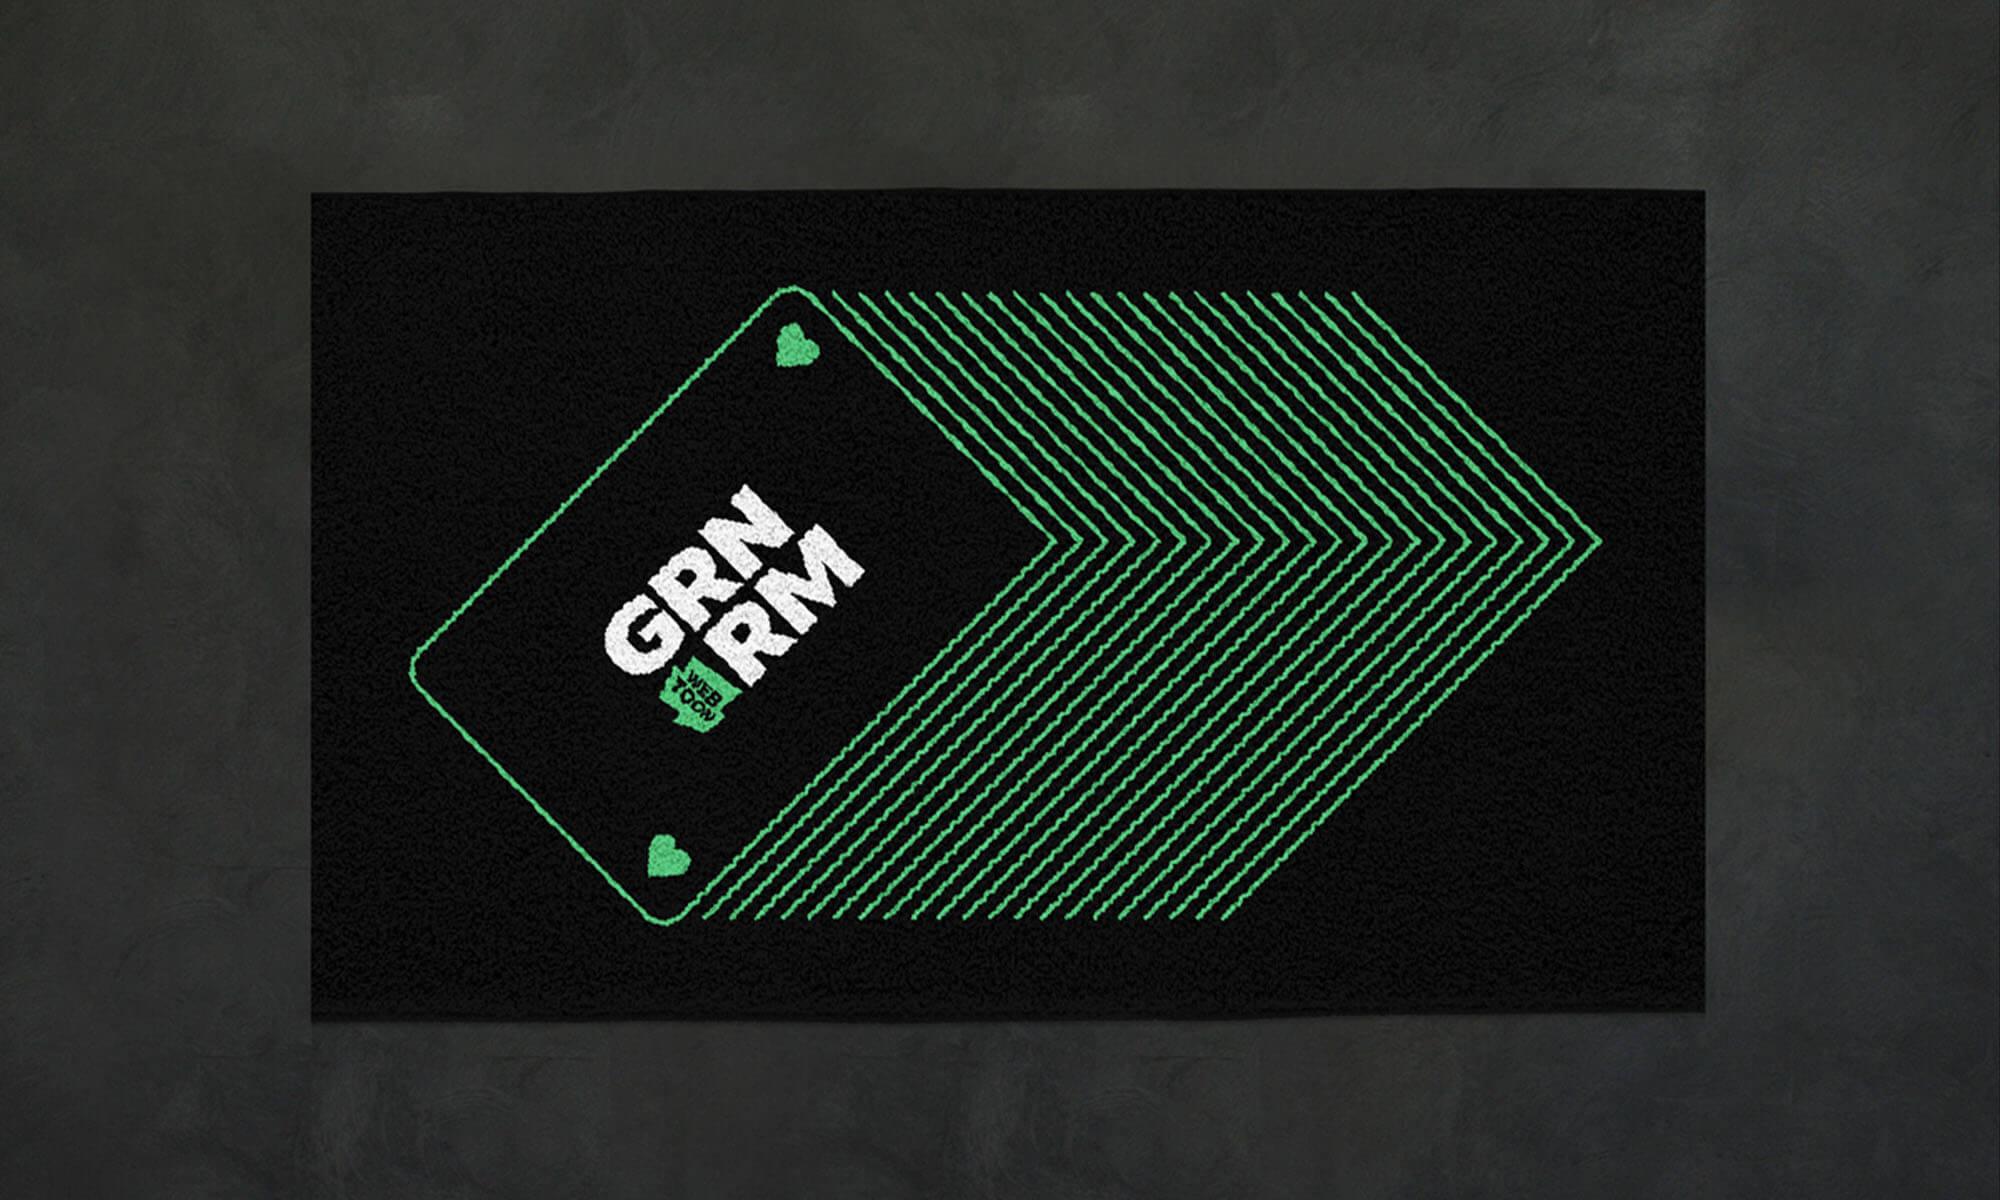 studio-malagon-green-room-rug.jpg